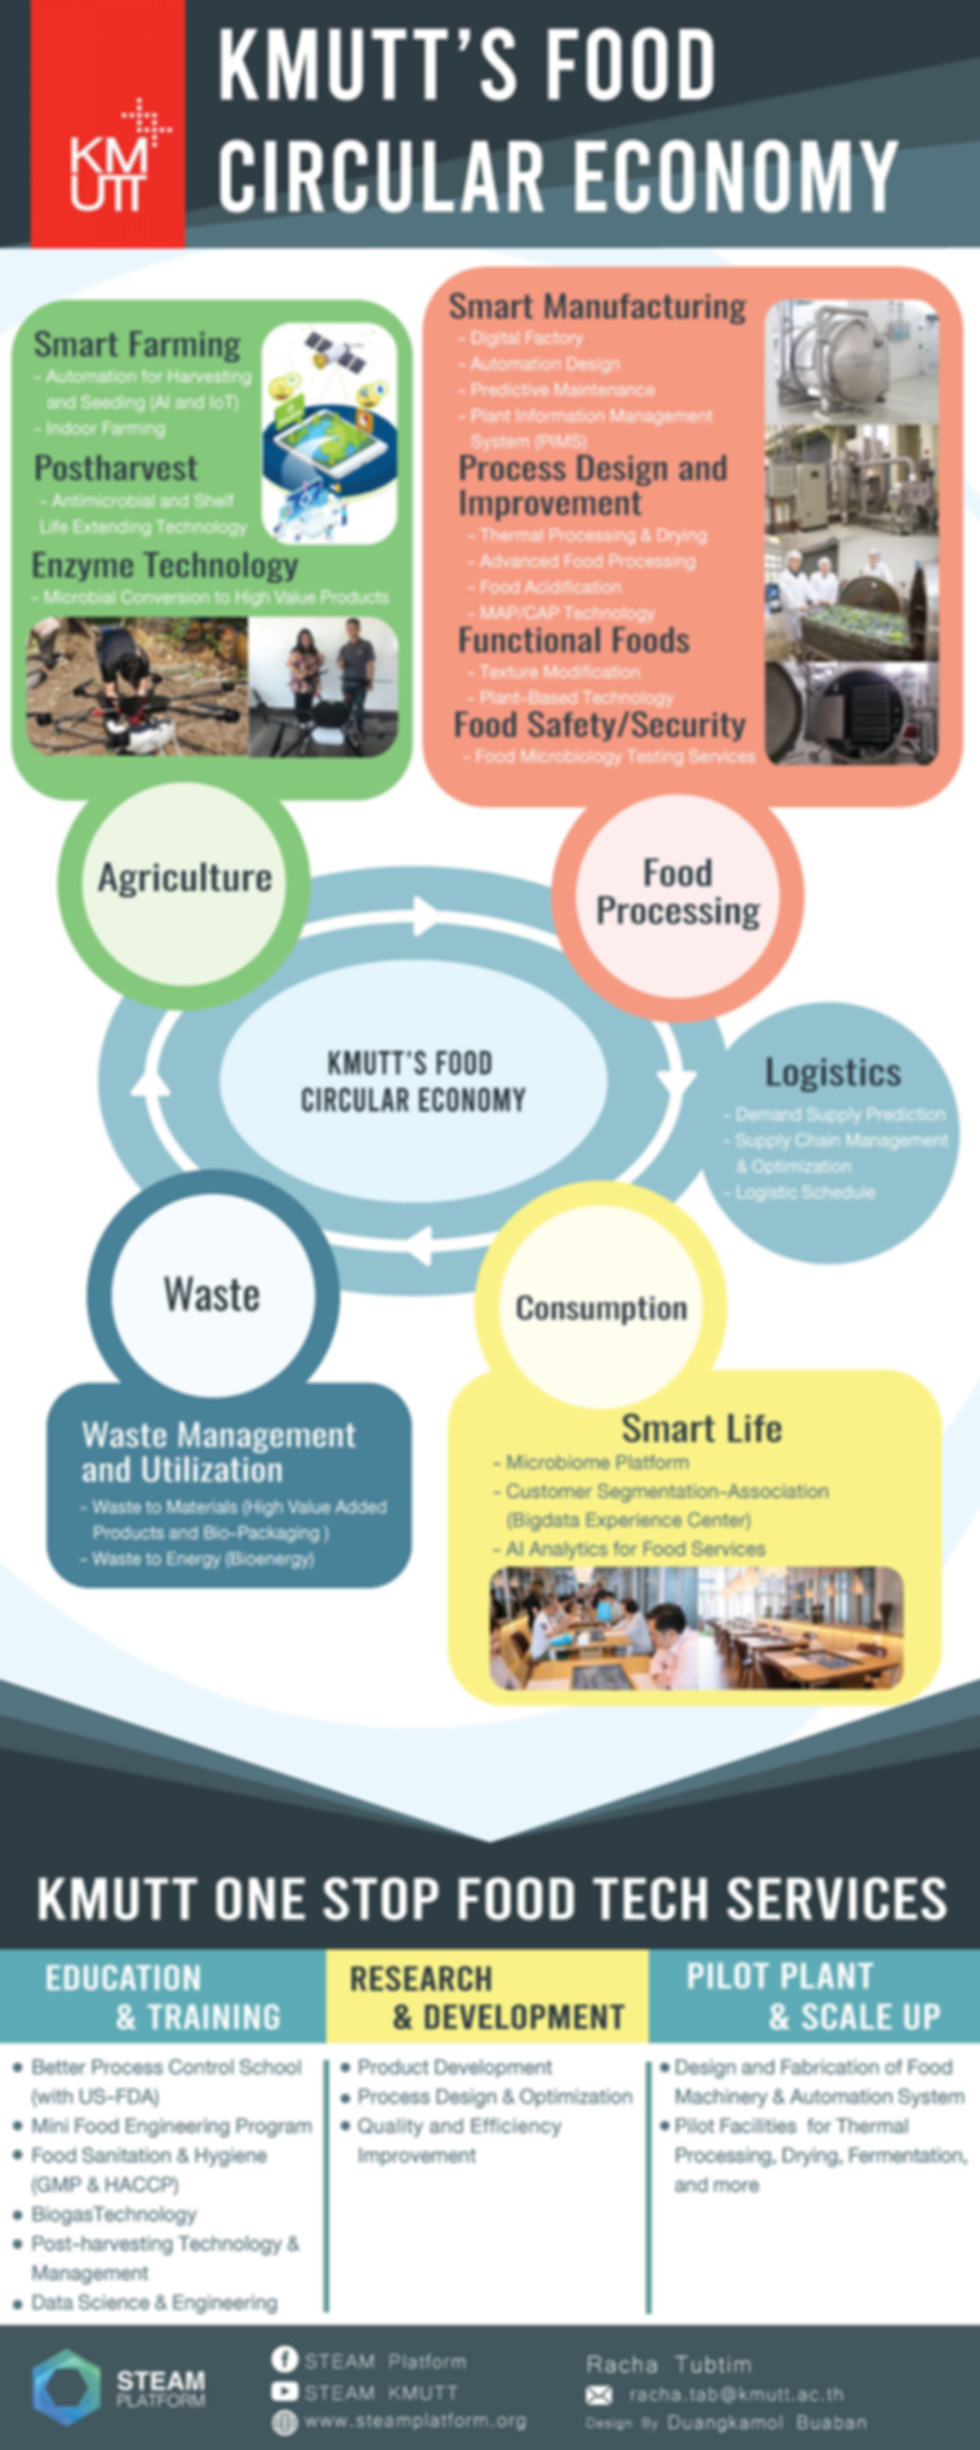 KMUTT's Food Circular Economy